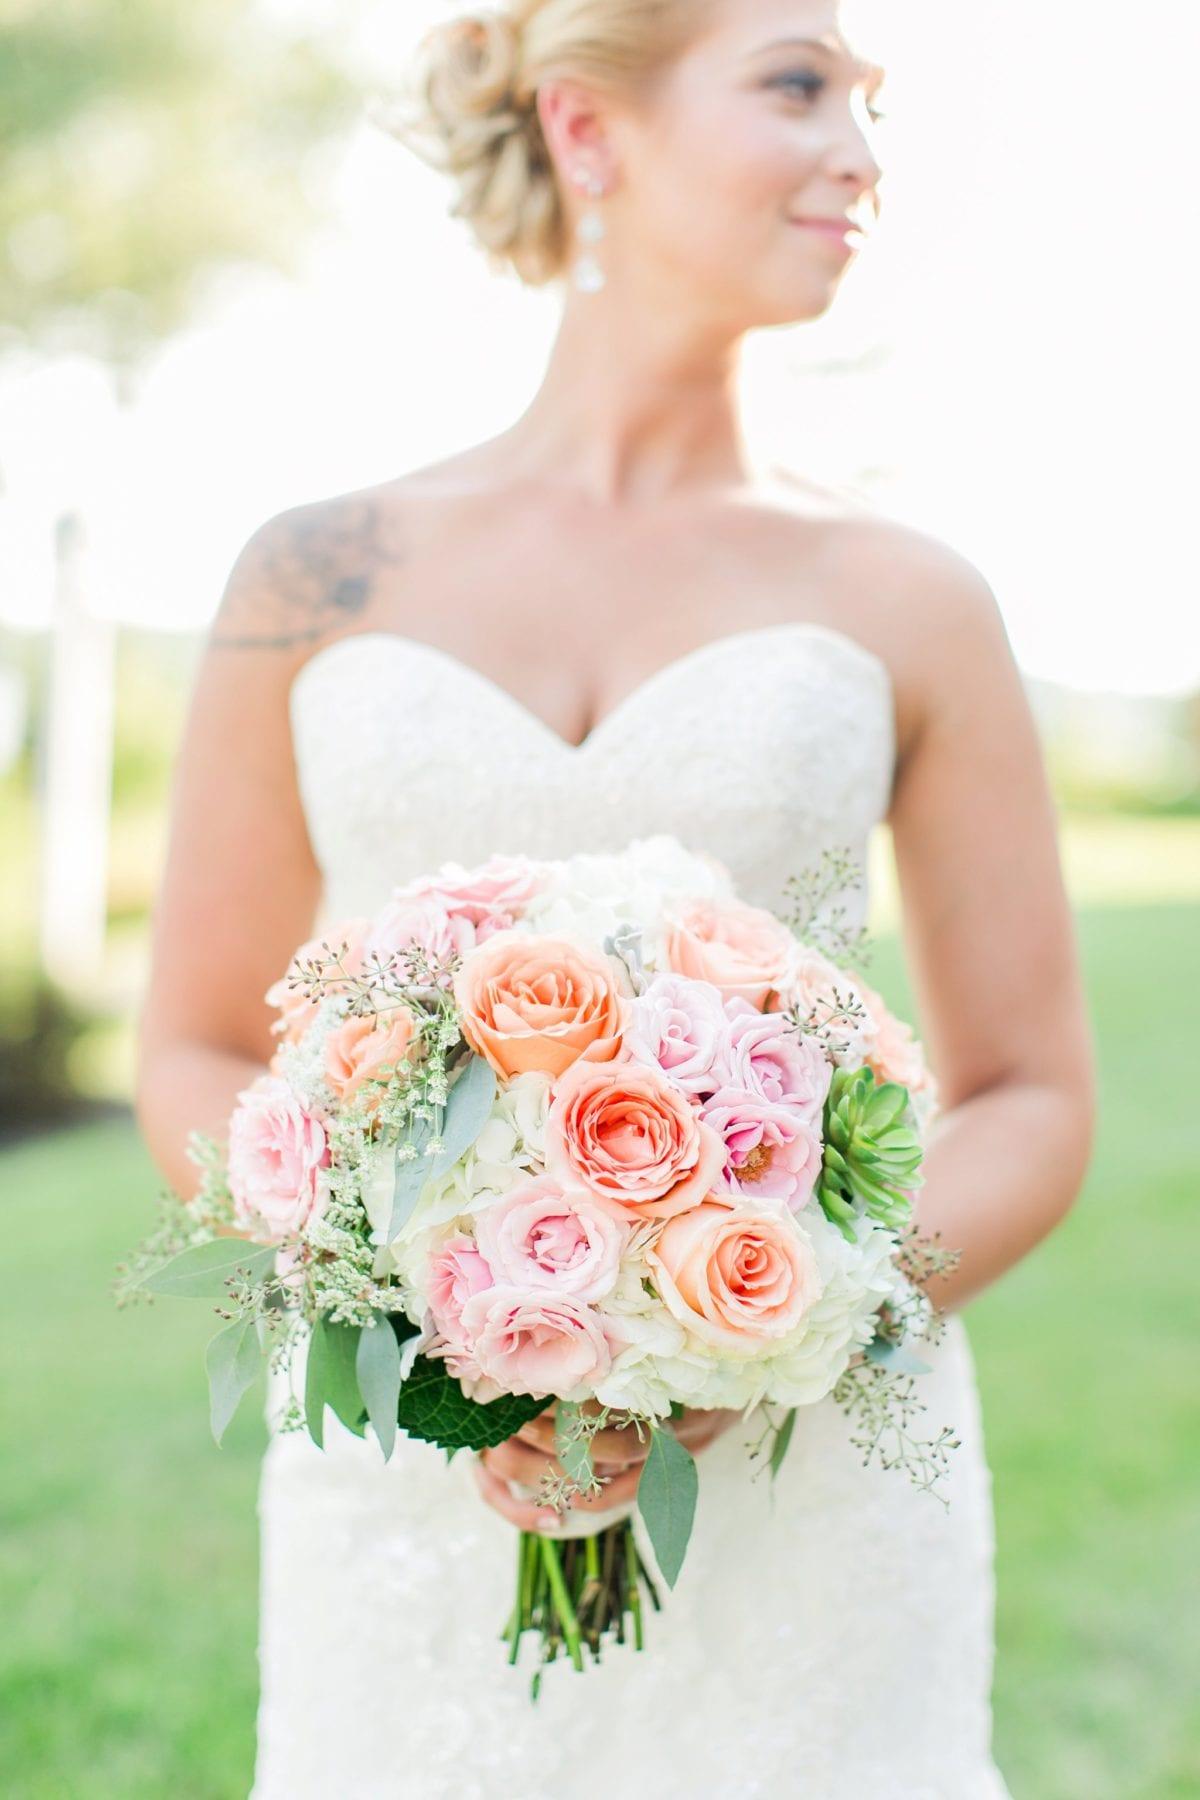 Waters Edge Wedding Photos Maryland Wedding Photographer Megan Kelsey Photography Katie & Conor-425.JPG